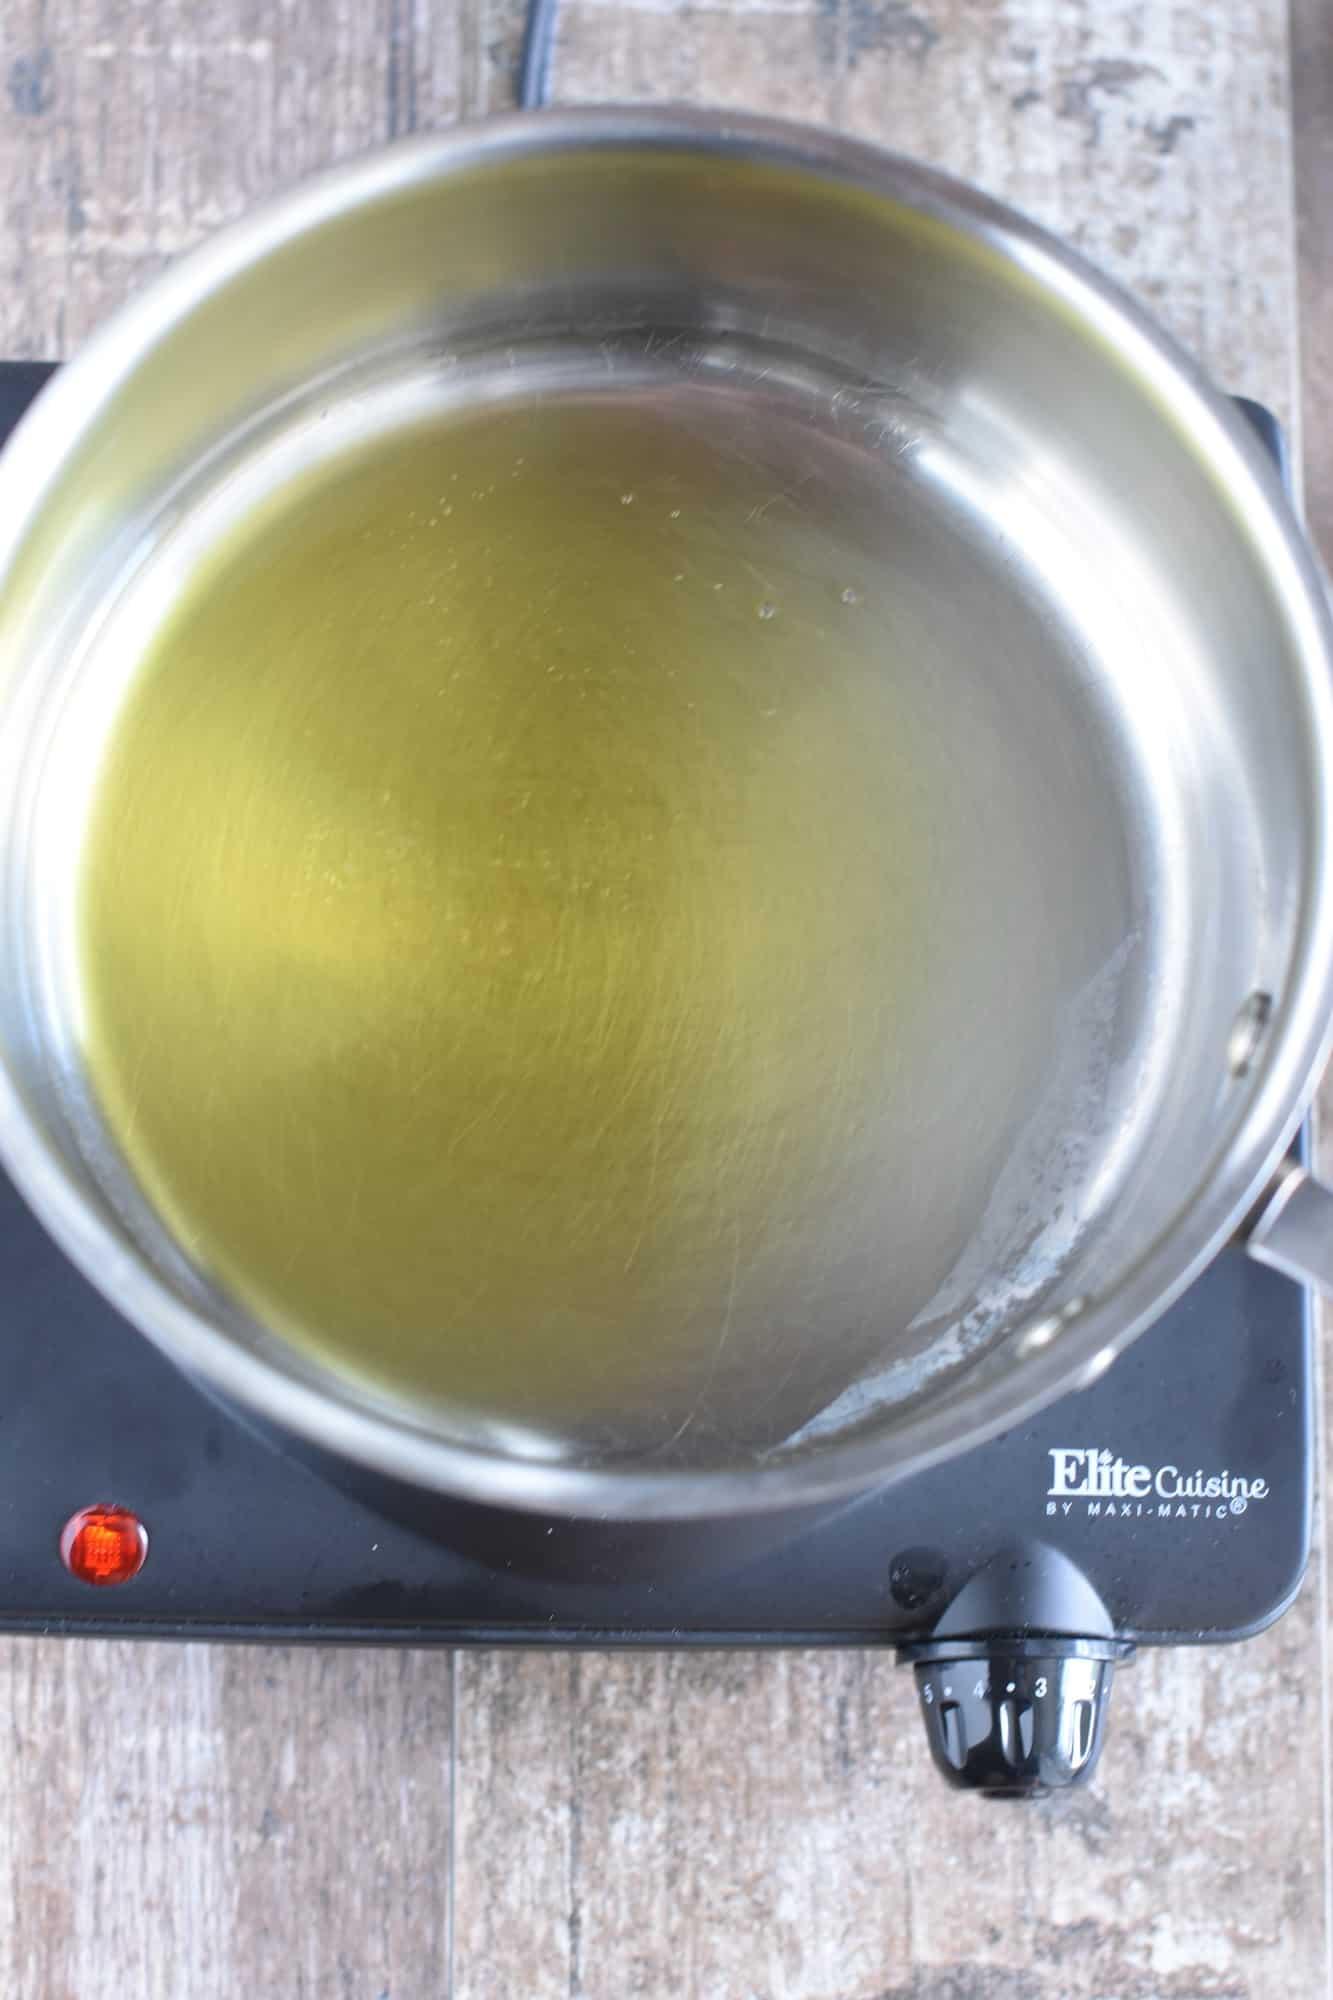 Heating olive oil in saucepan